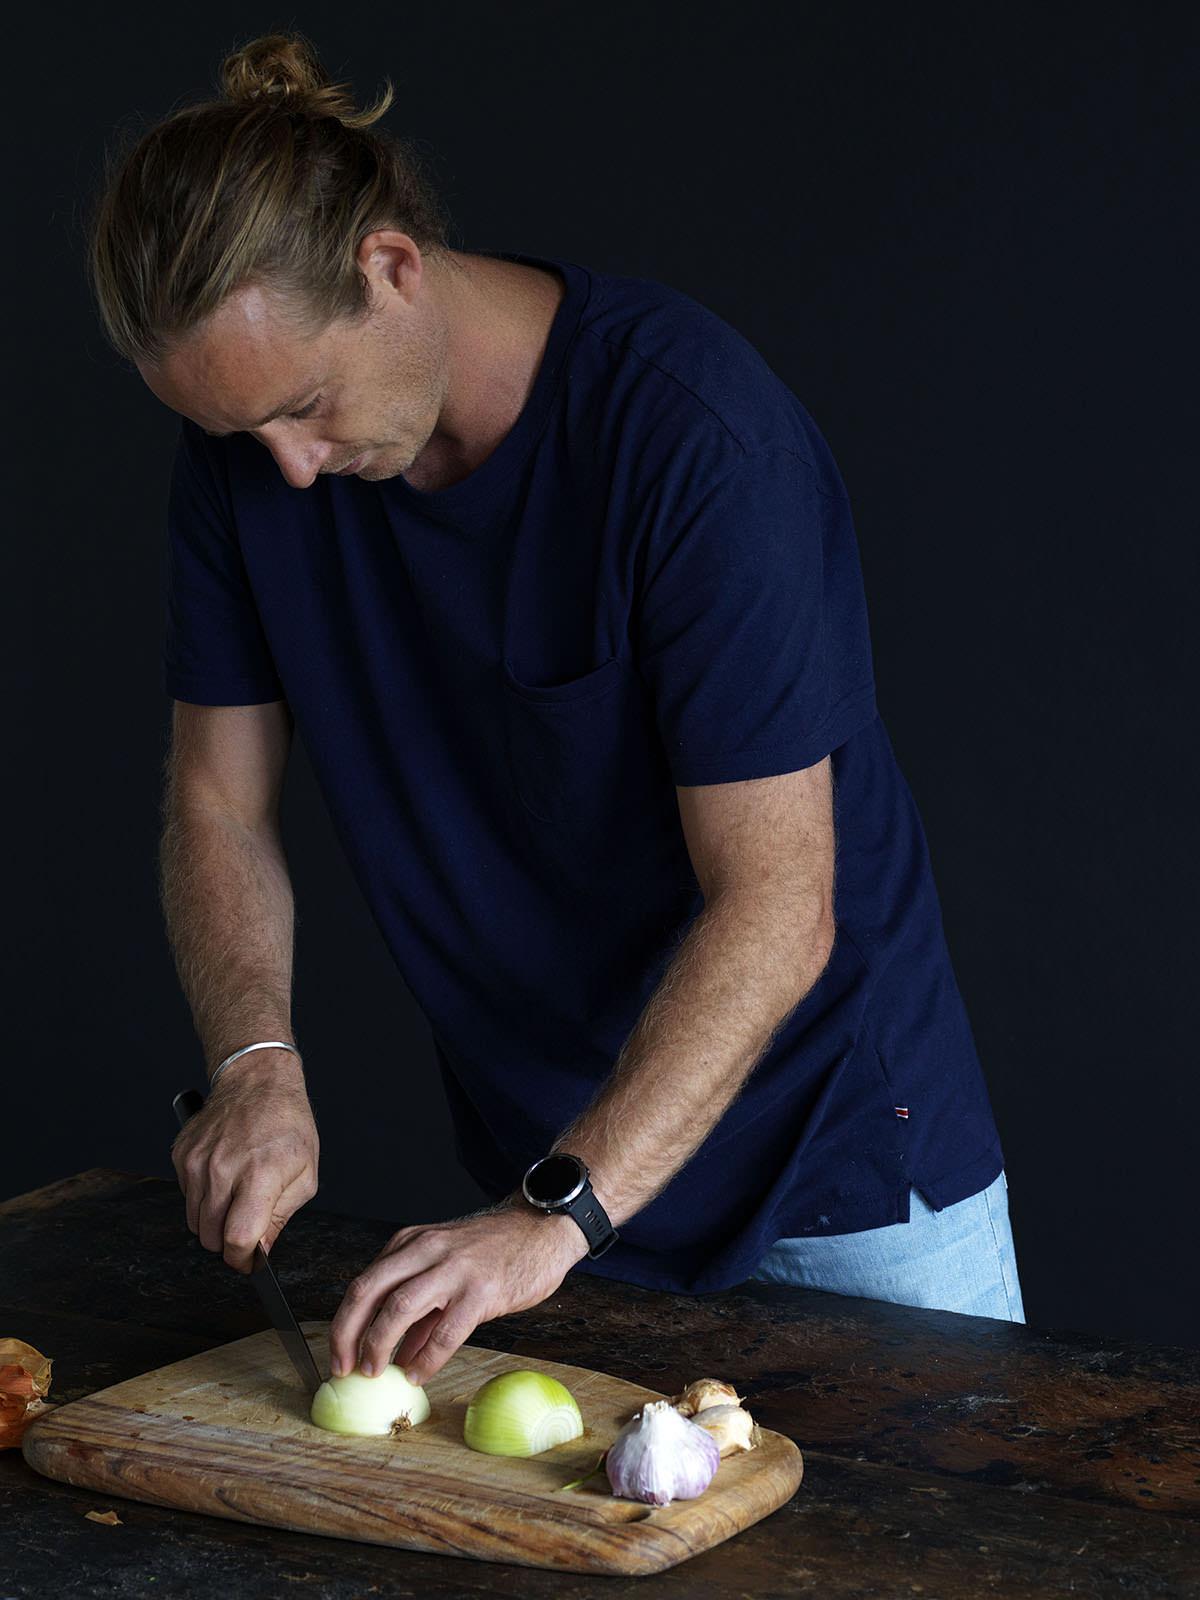 Guy preparing ingredients for his one-pot wonder.